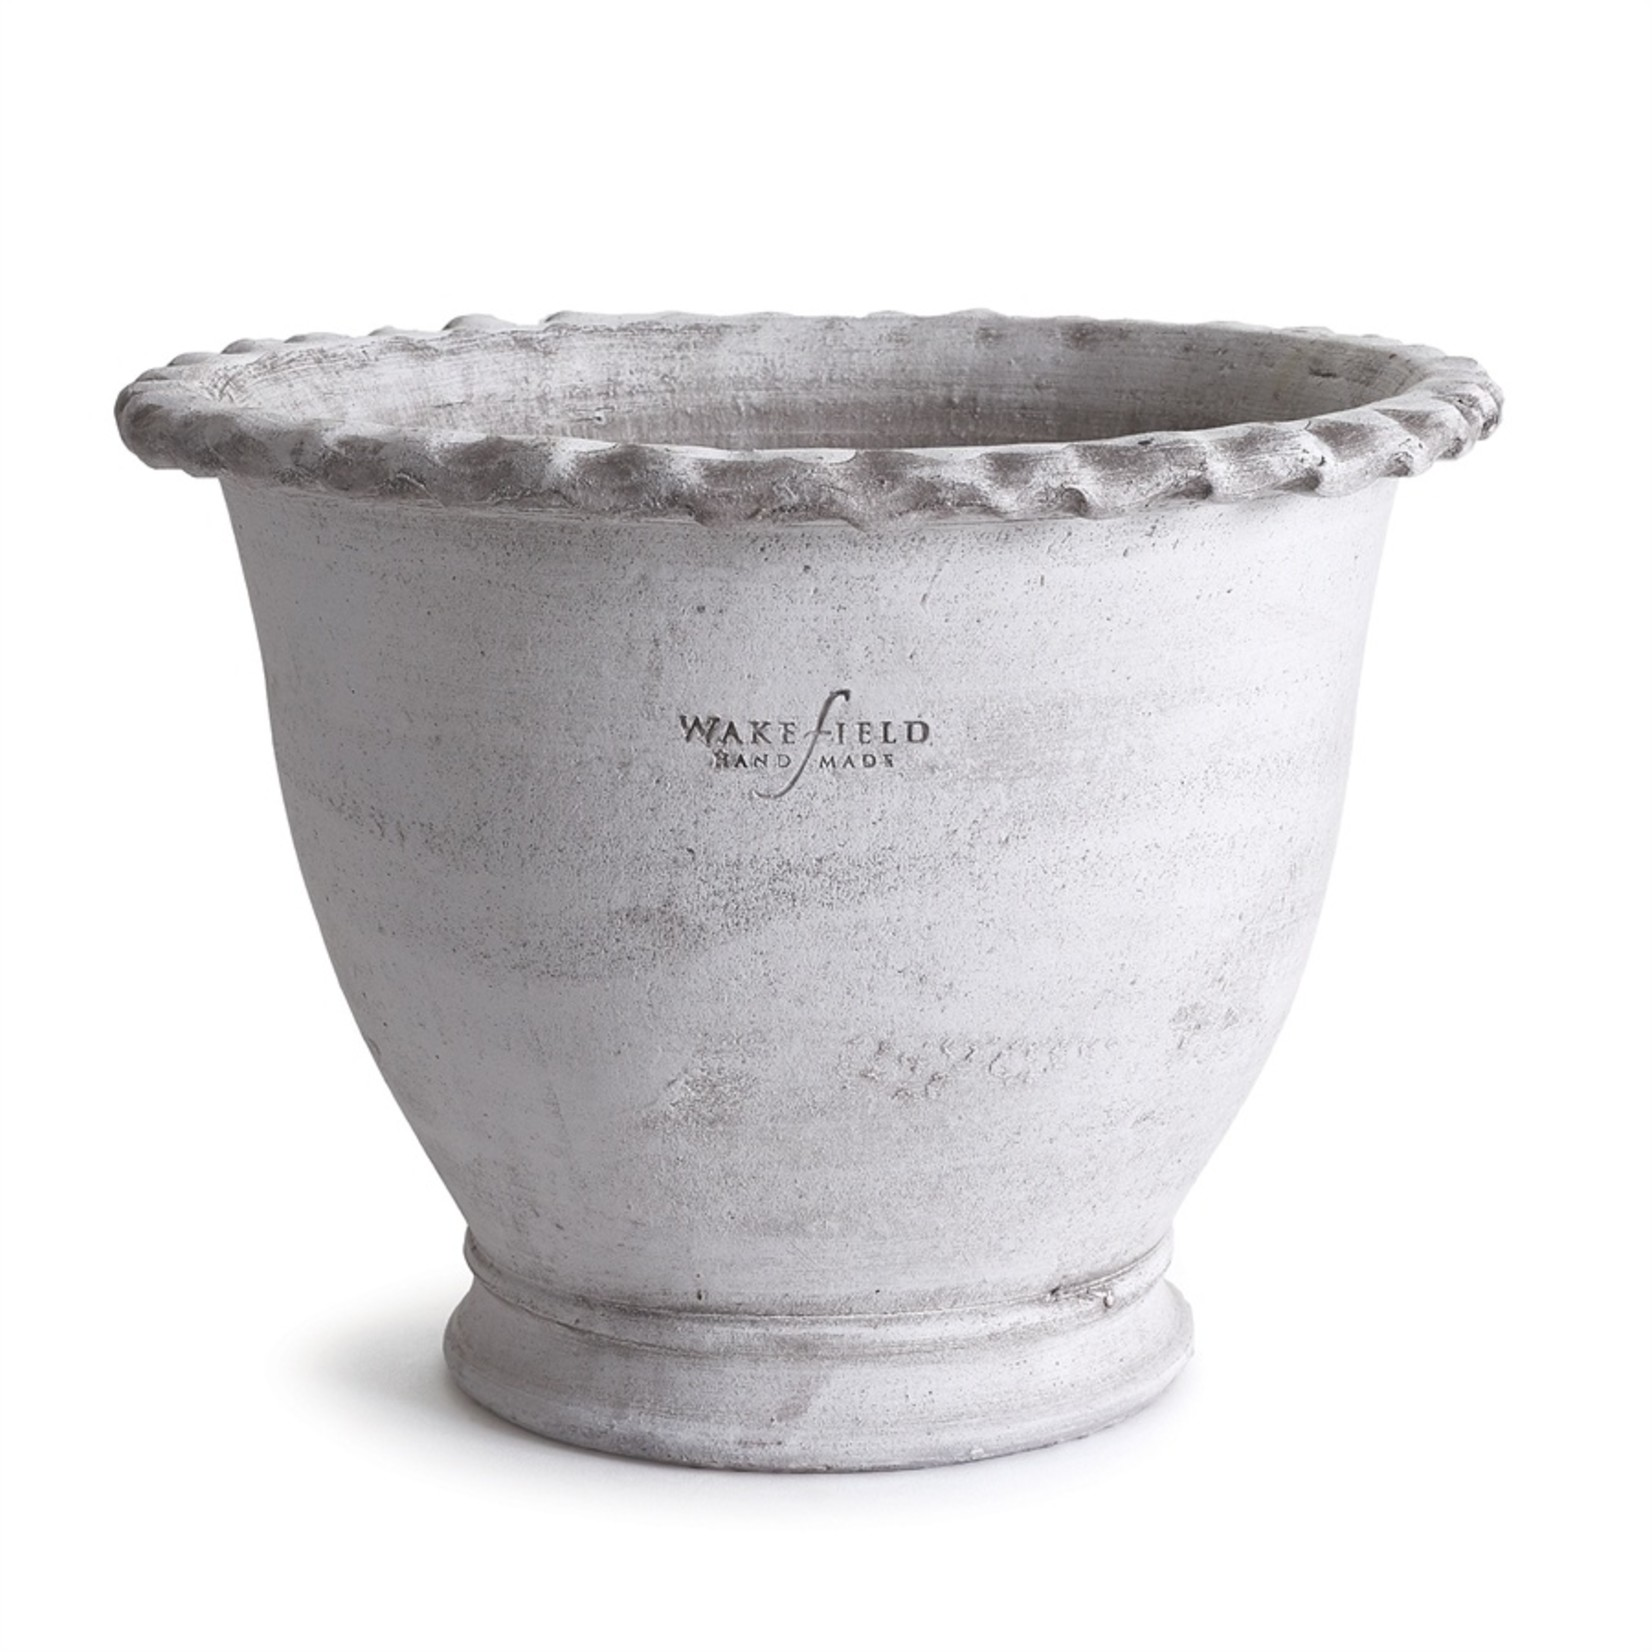 Napa Home and Garden Wakefield Handmade Alvena Pot